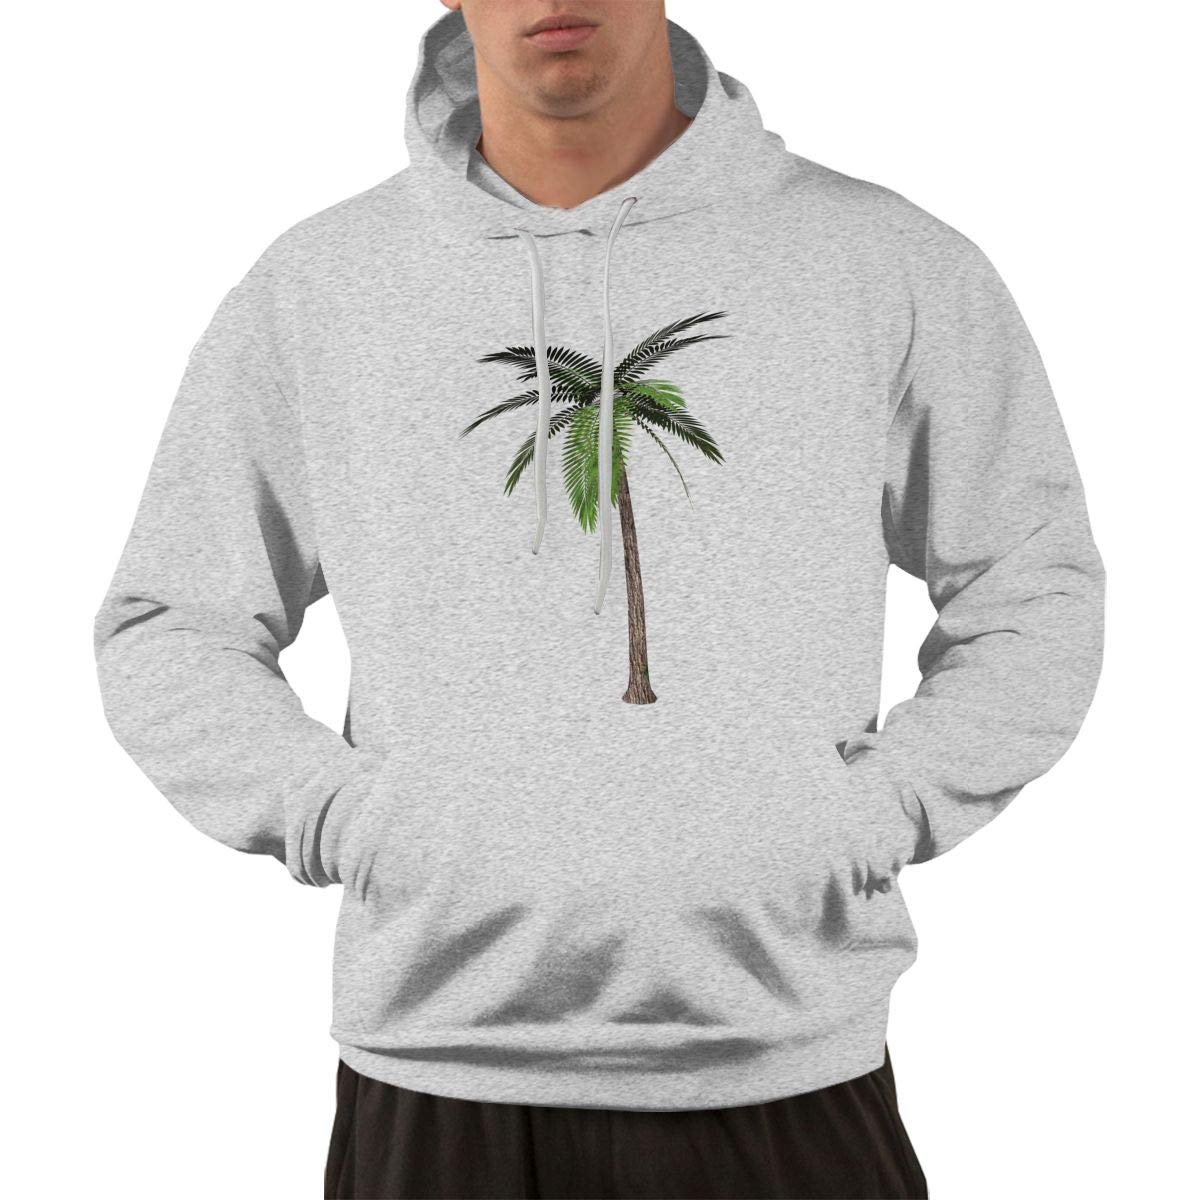 KEQ/&JSW Mens EcoSmart Sweatshirt Hoodie Palm Tree Sport Outwear with Kanga Pocket